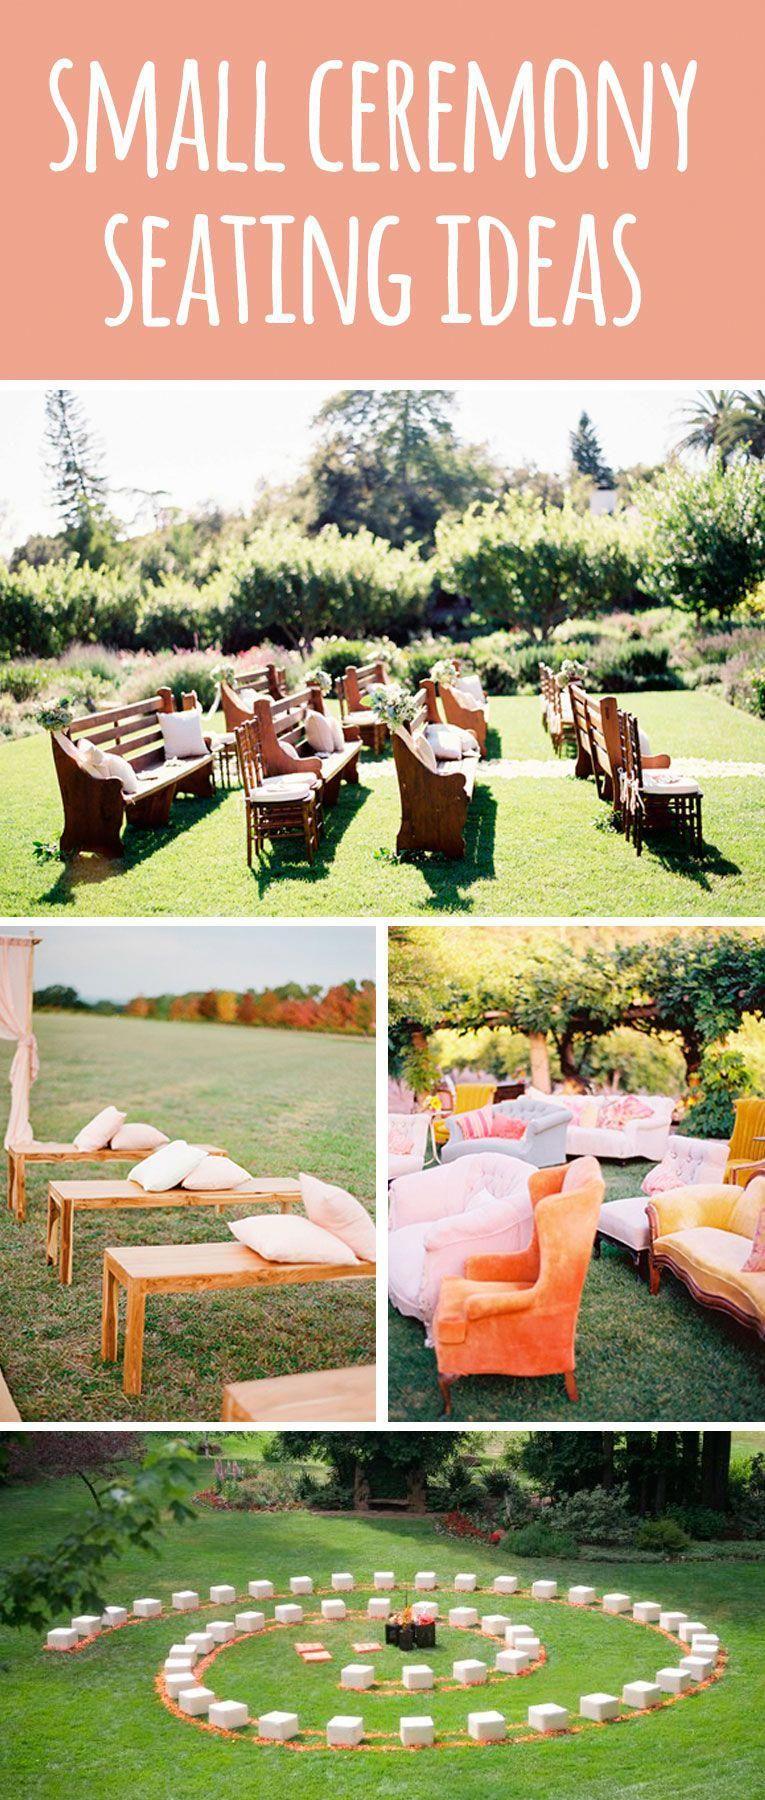 Small wedding ceremony seating ideas smallwedding topbeddings